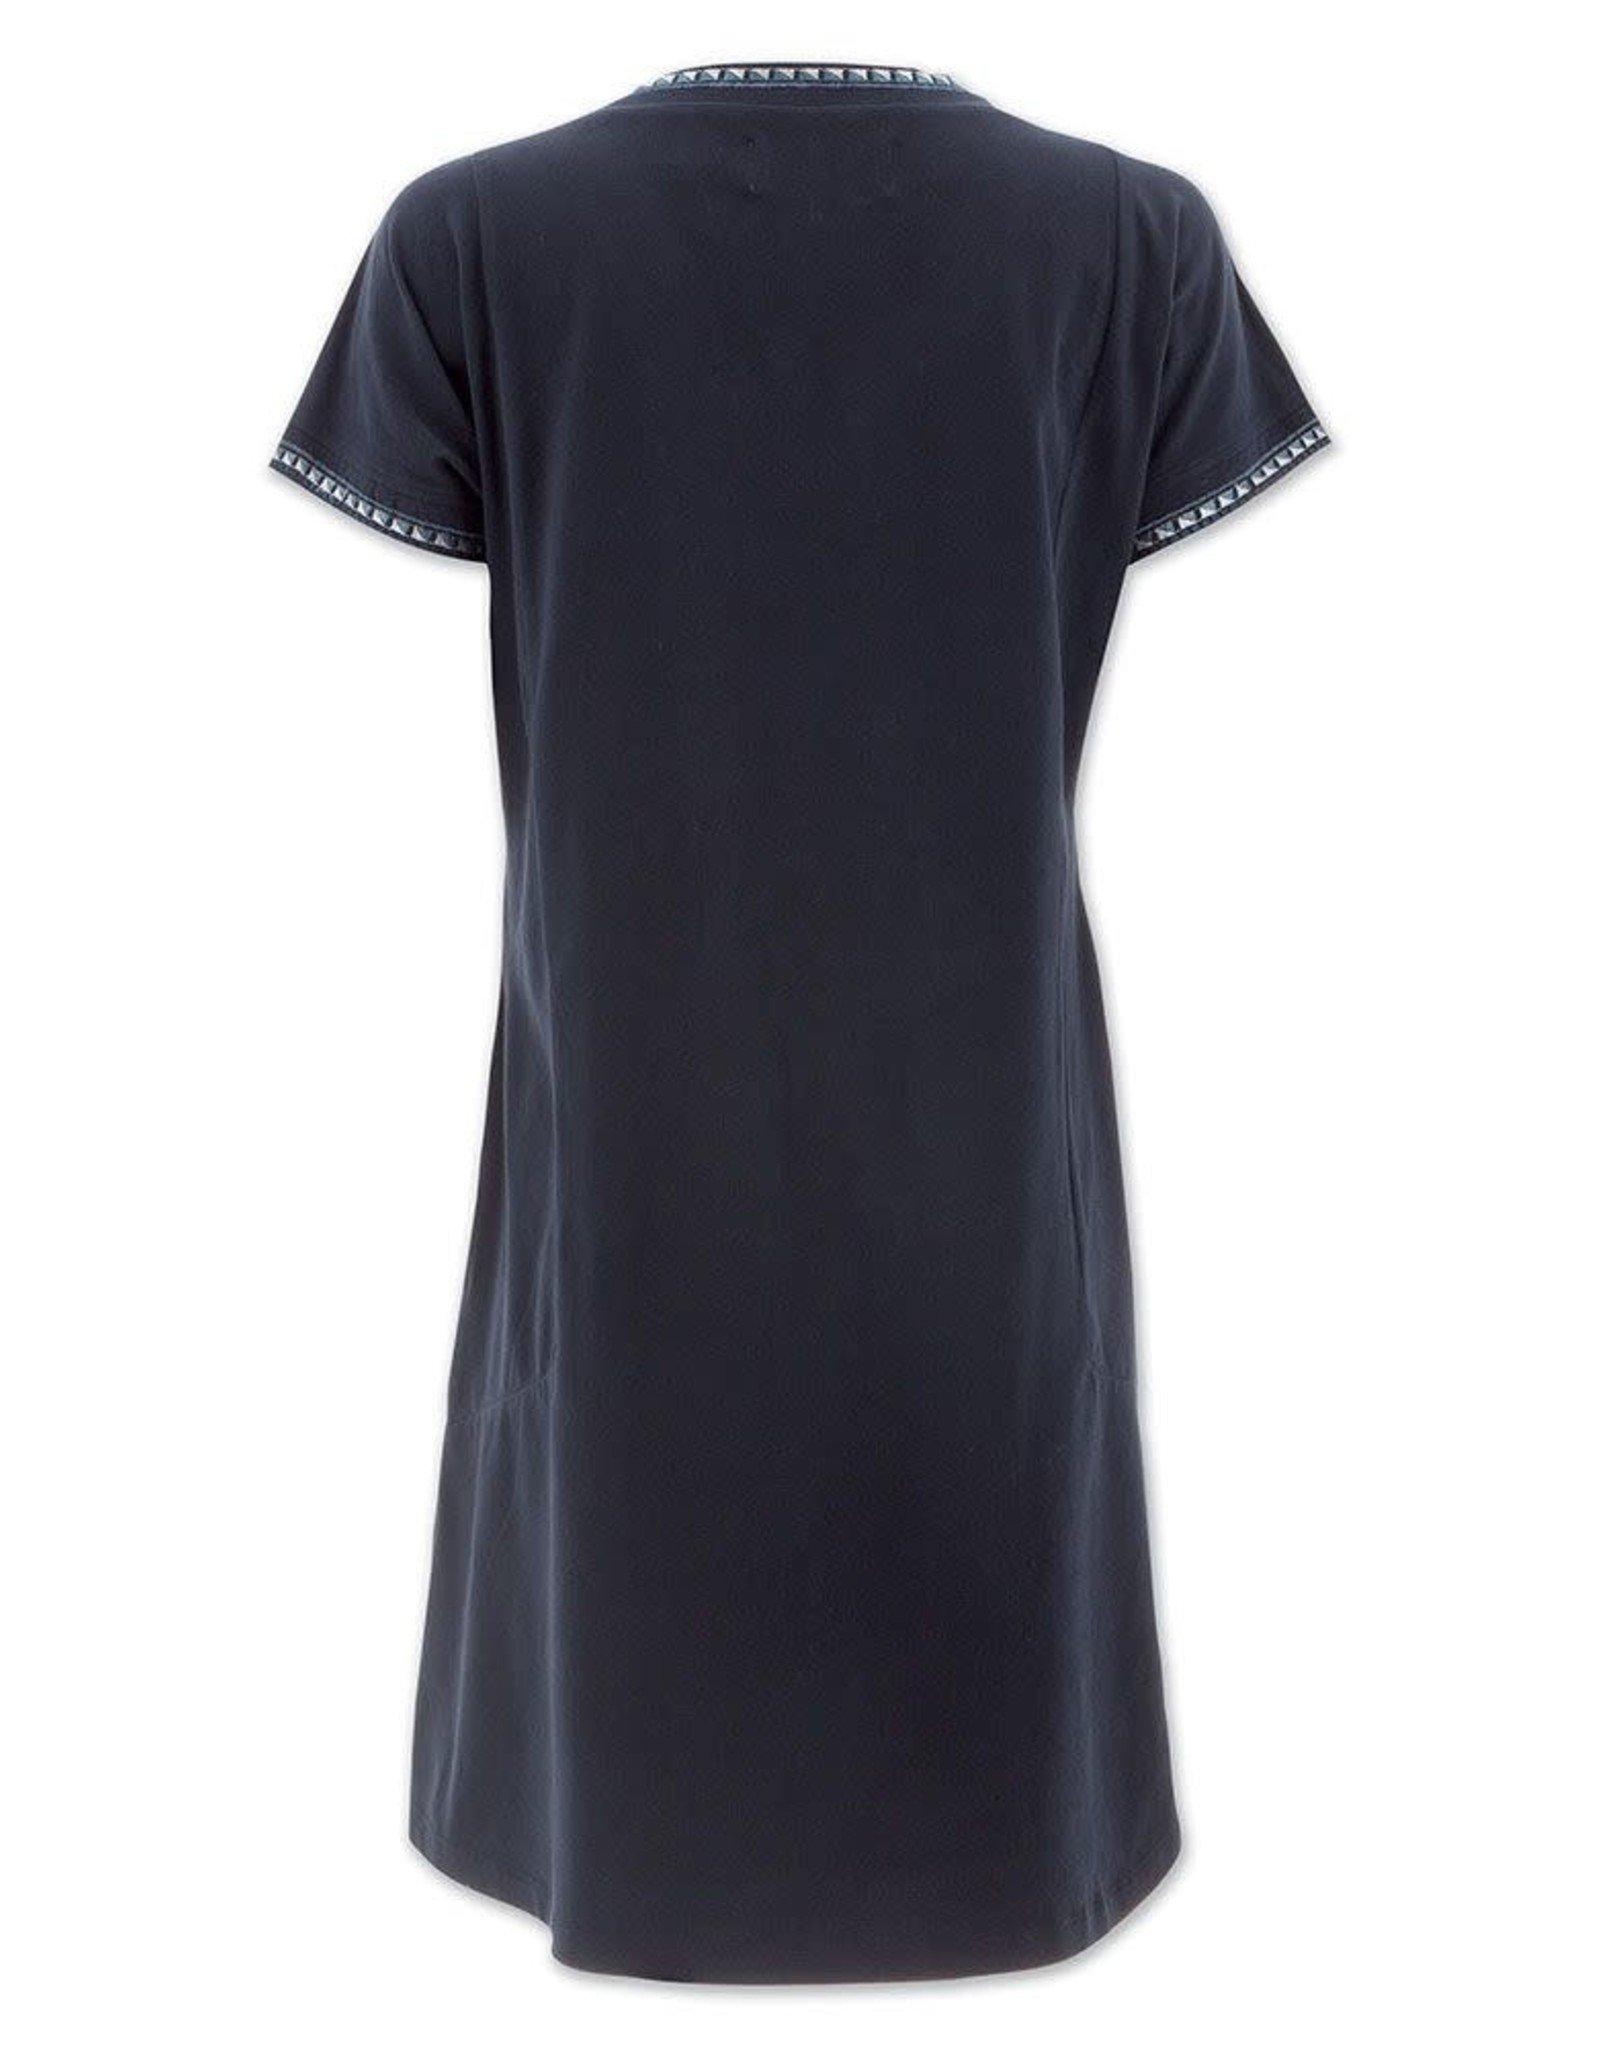 - Black Short Sleeve Dress w/Embroidered Trim